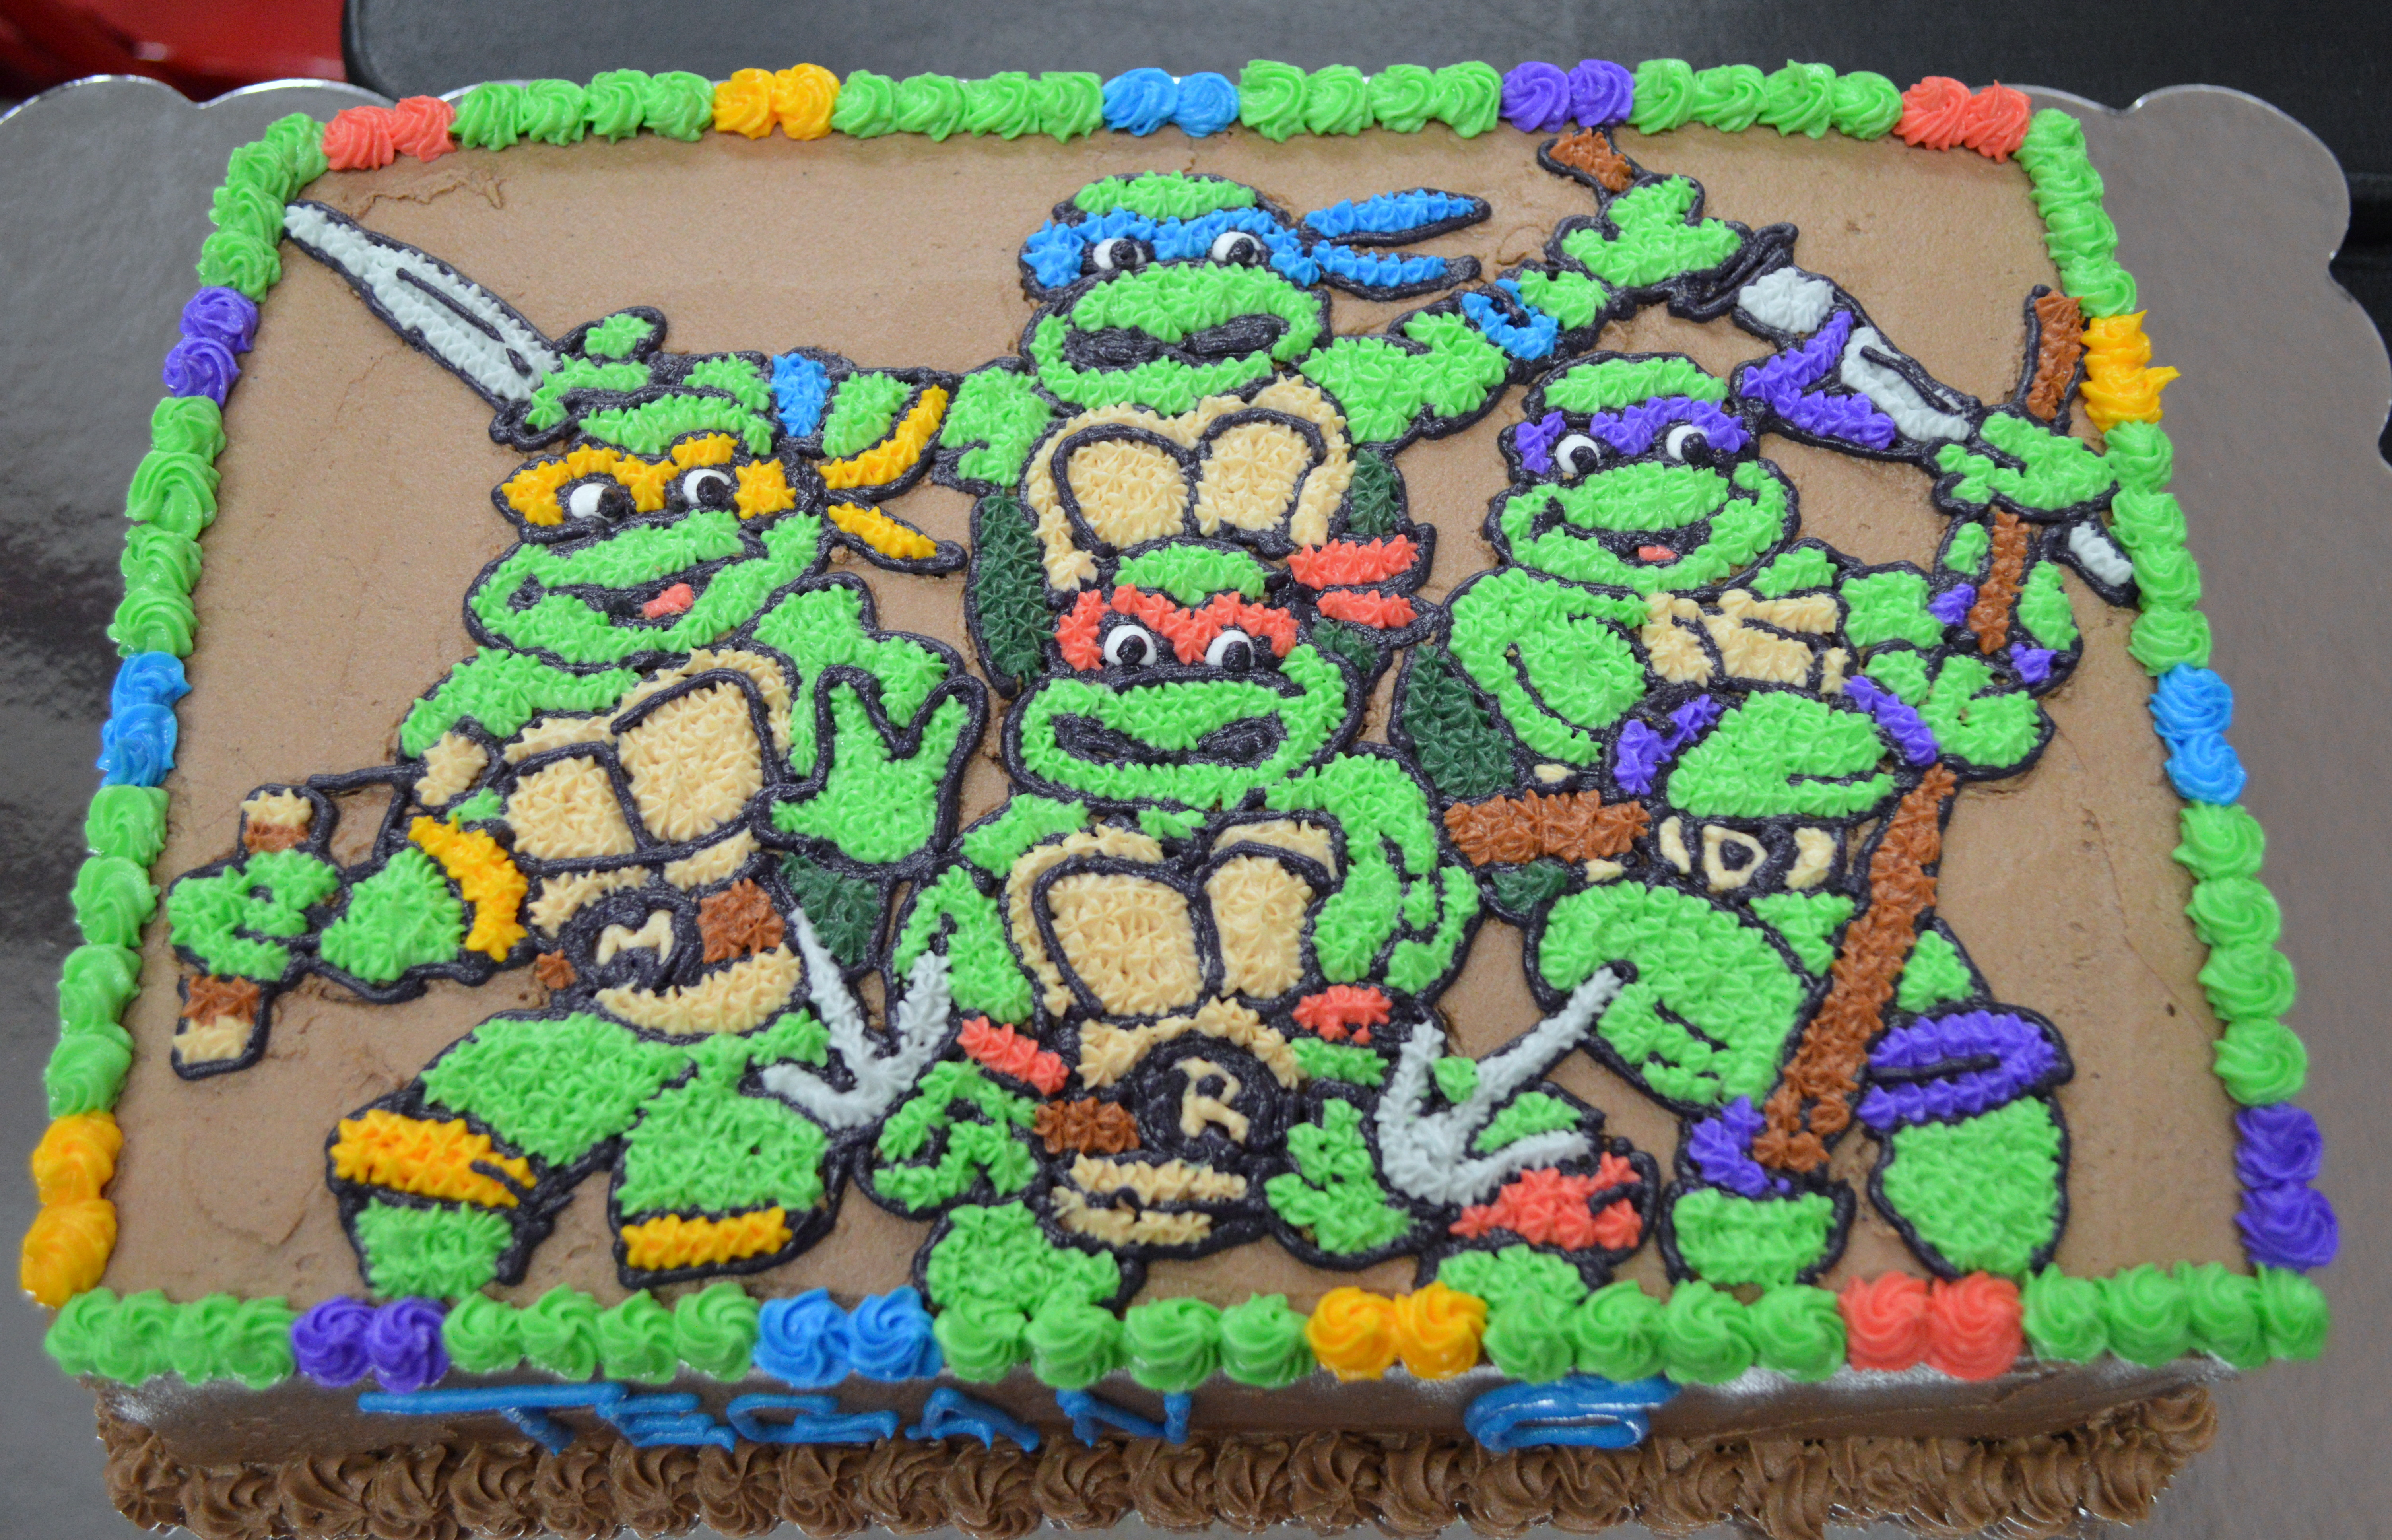 Teenage Mutant Ninja Turtle Sheet Cake Antaexpocoaching